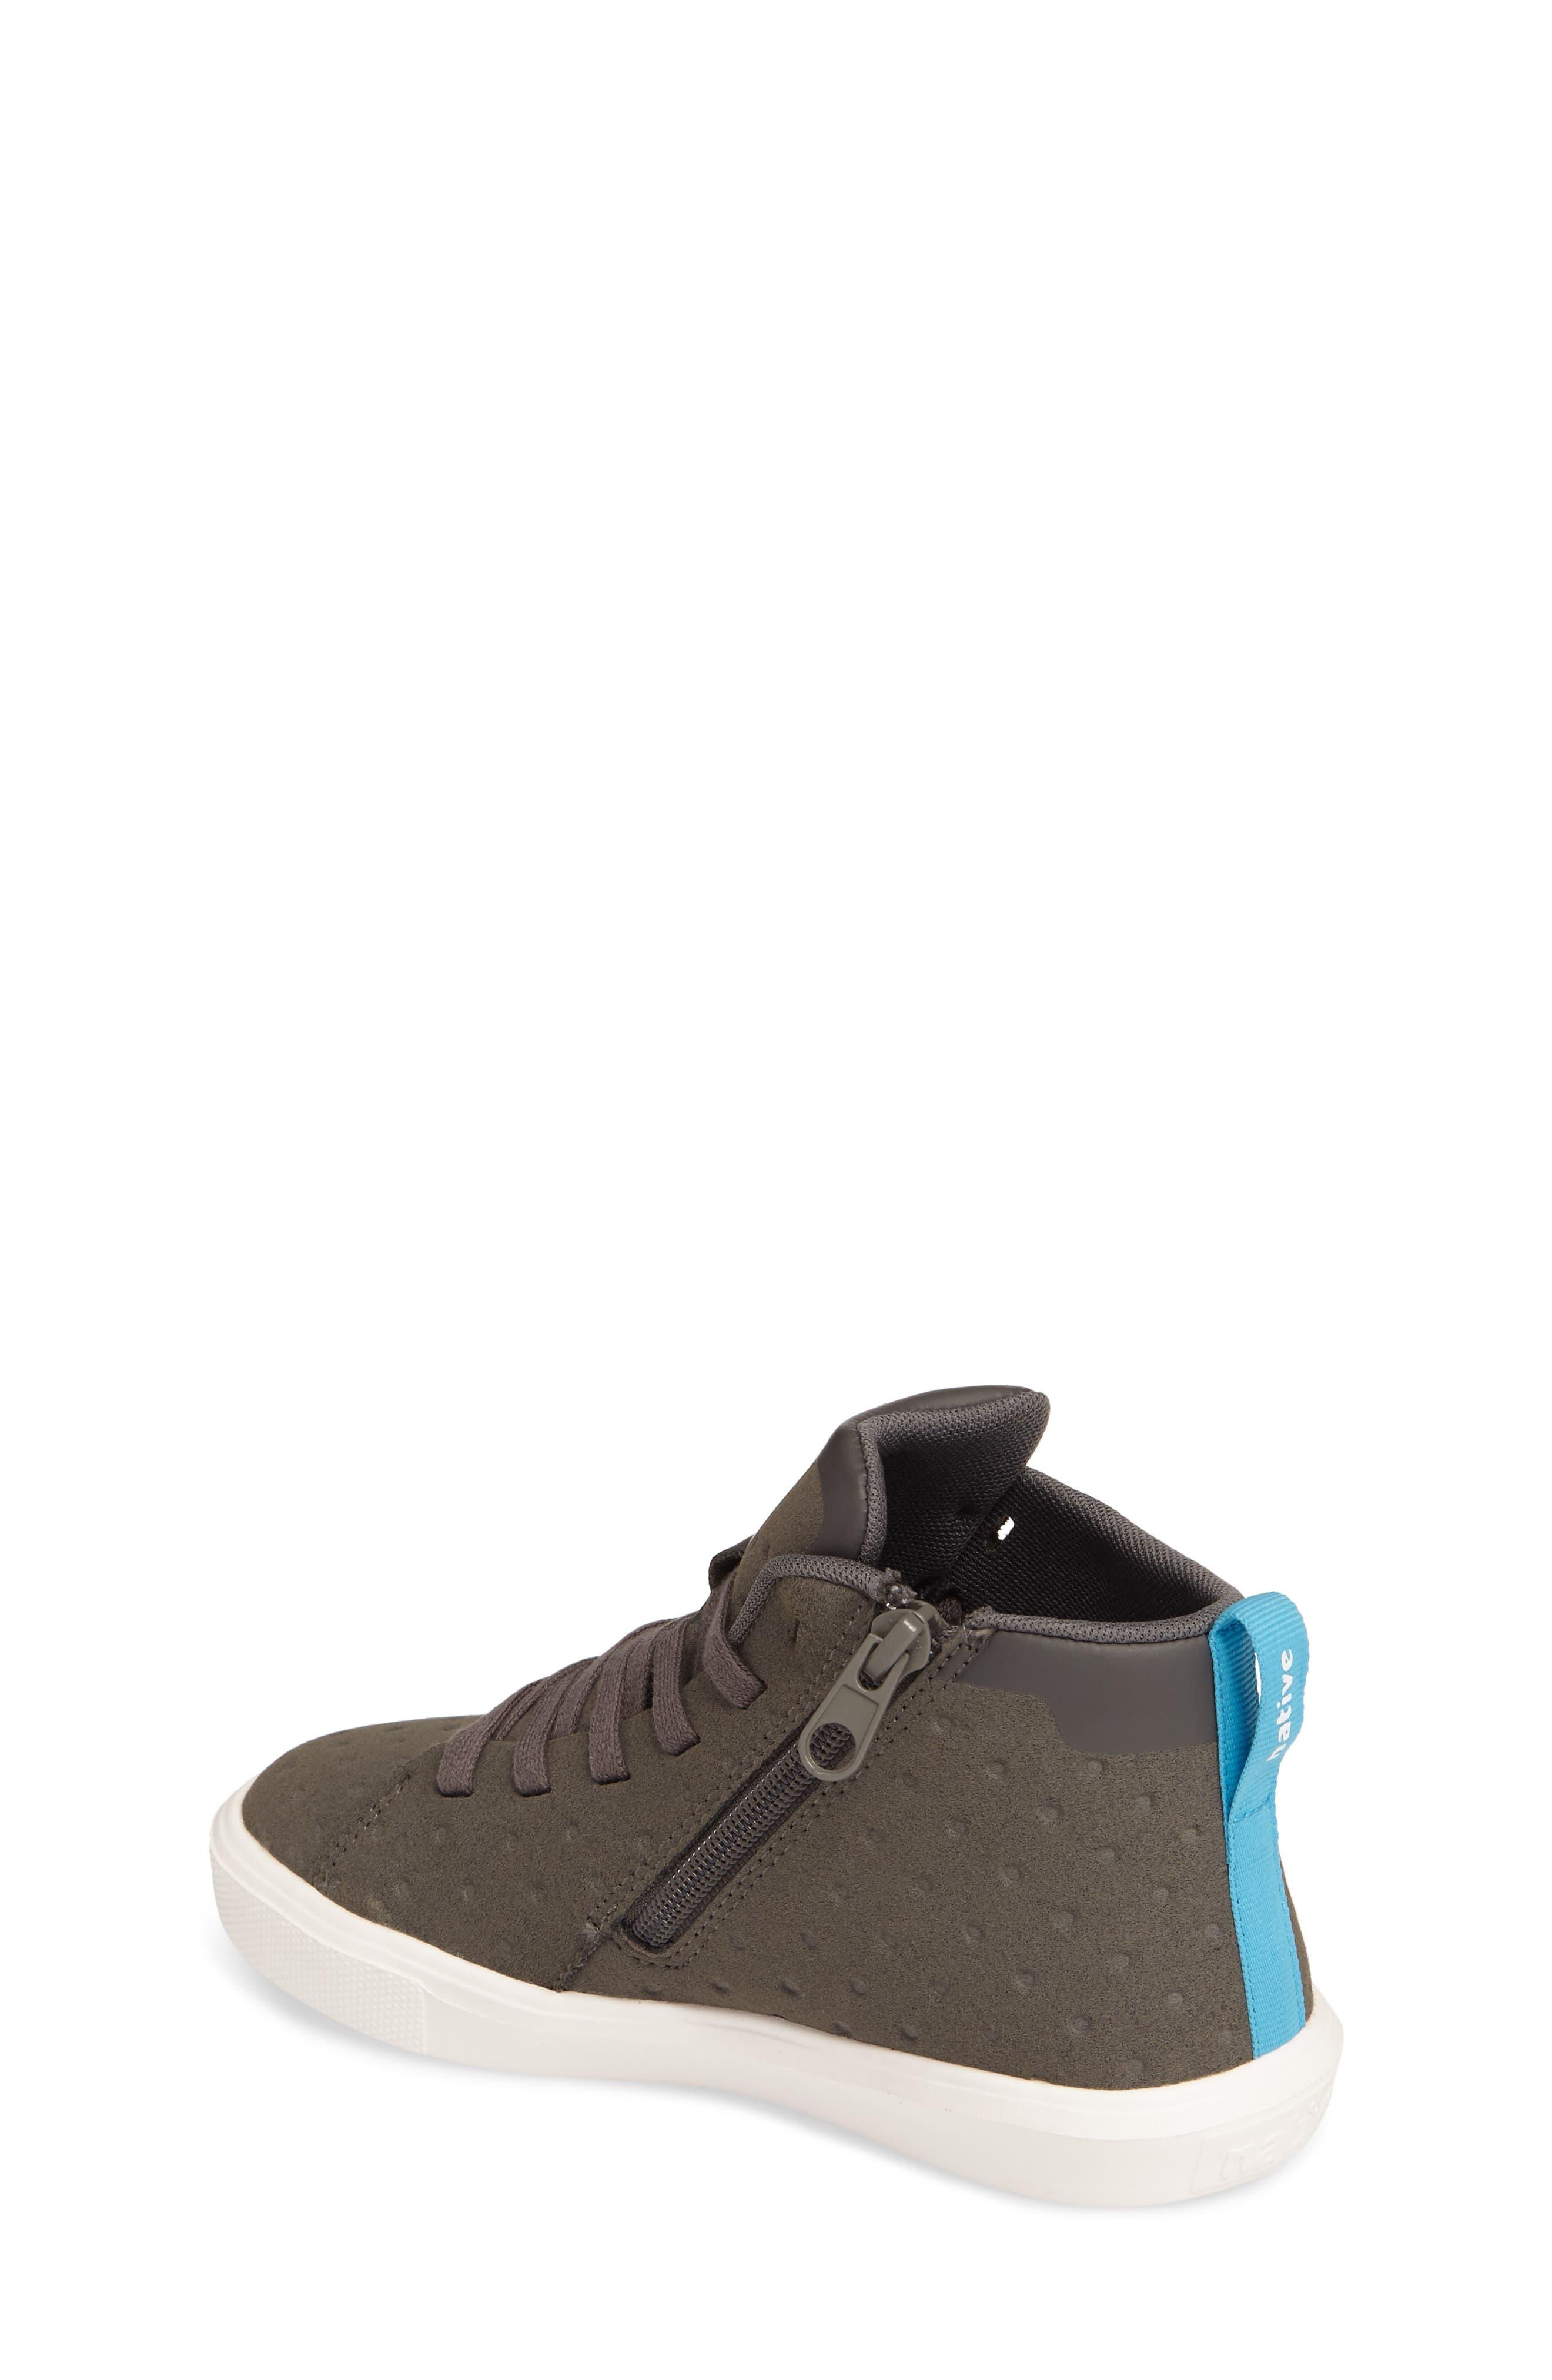 Native Monaco Sneaker,                             Alternate thumbnail 2, color,                             024